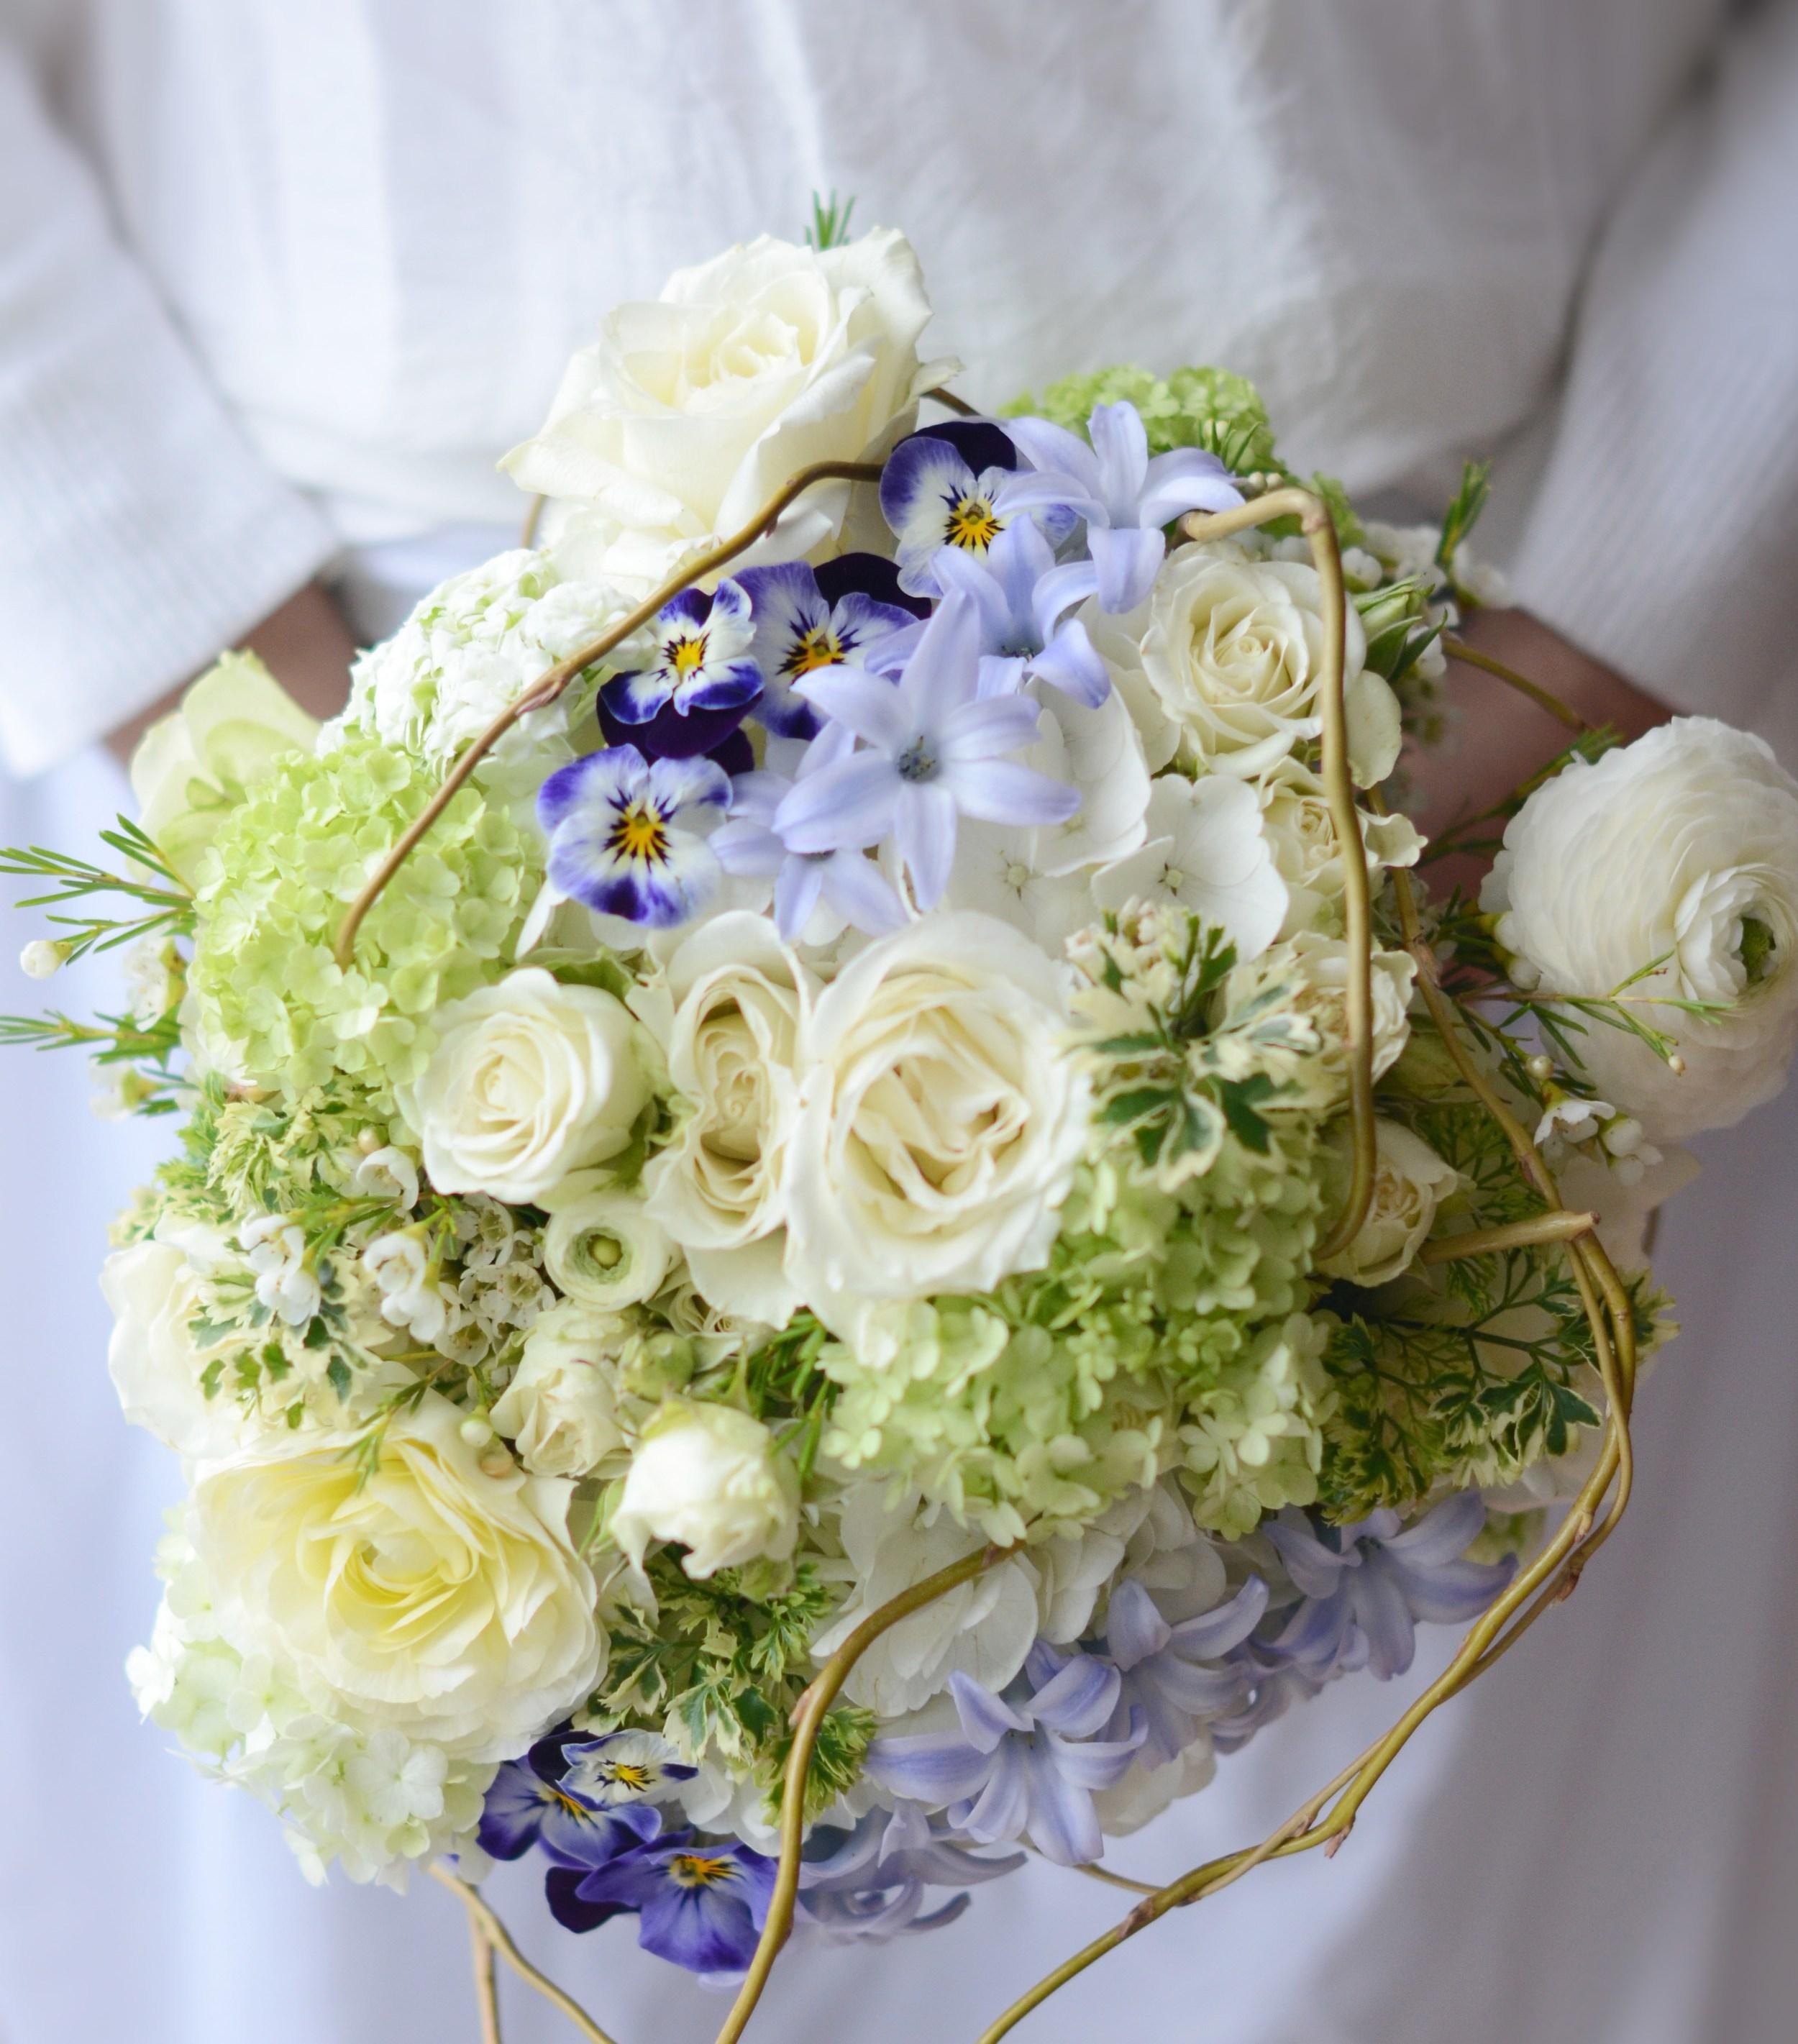 Floral Design by Lili